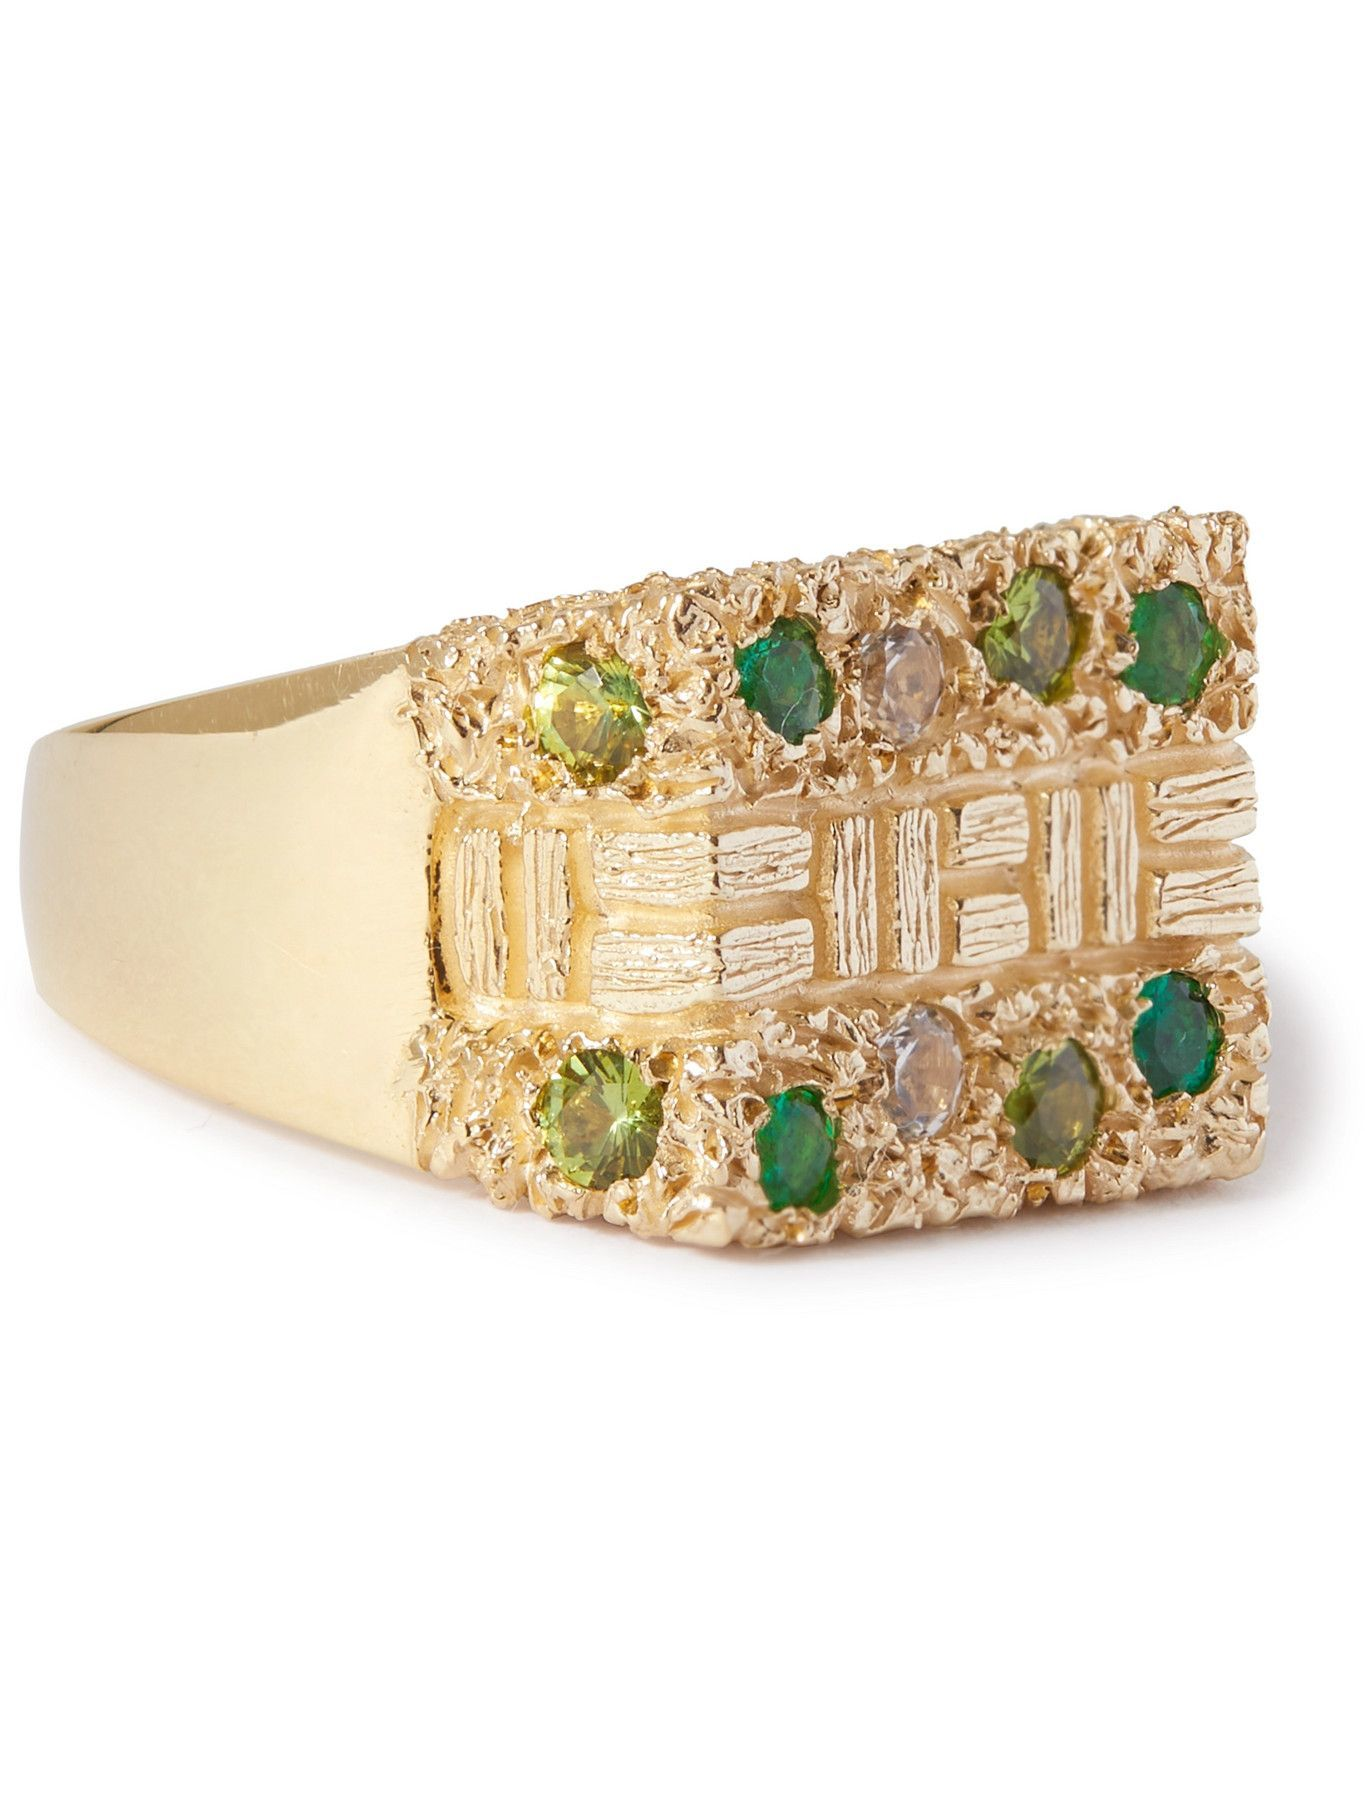 Photo: Bleue Burnham - Sissinghurst 9-Karat Gold, Emerald and Sapphire Signet Ring - Gold